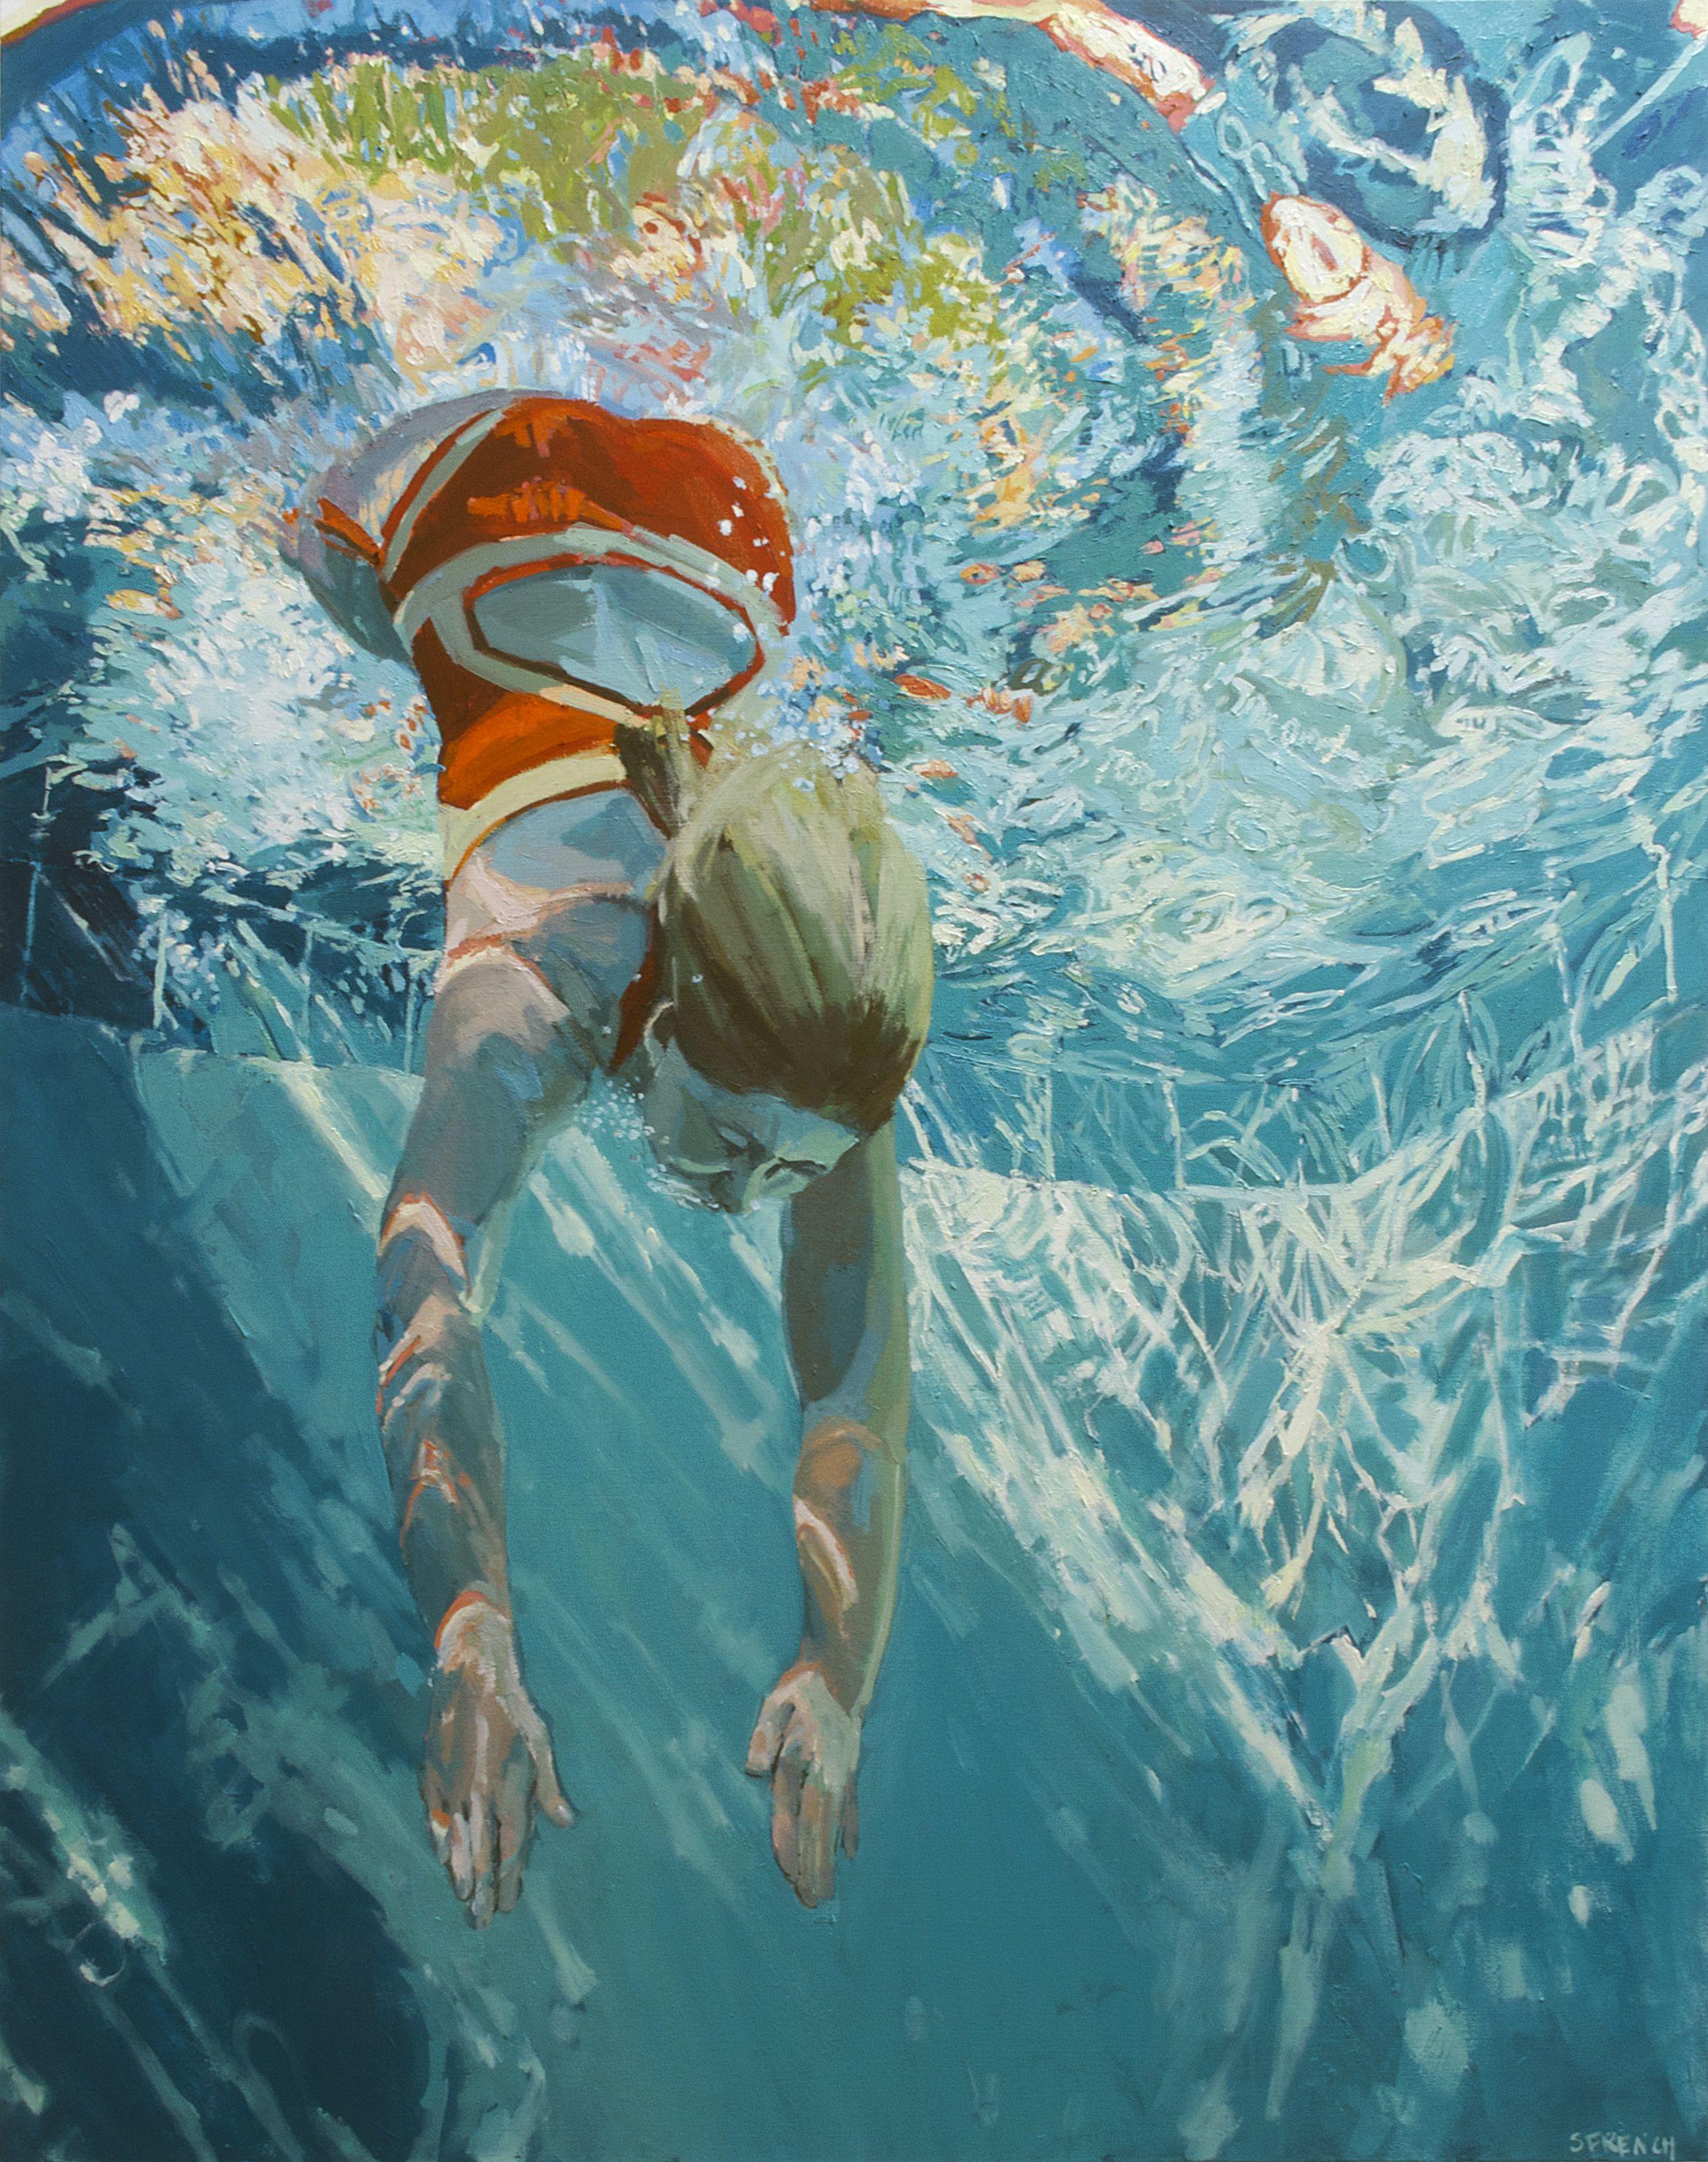 underwater painting of people by houston - 721×913